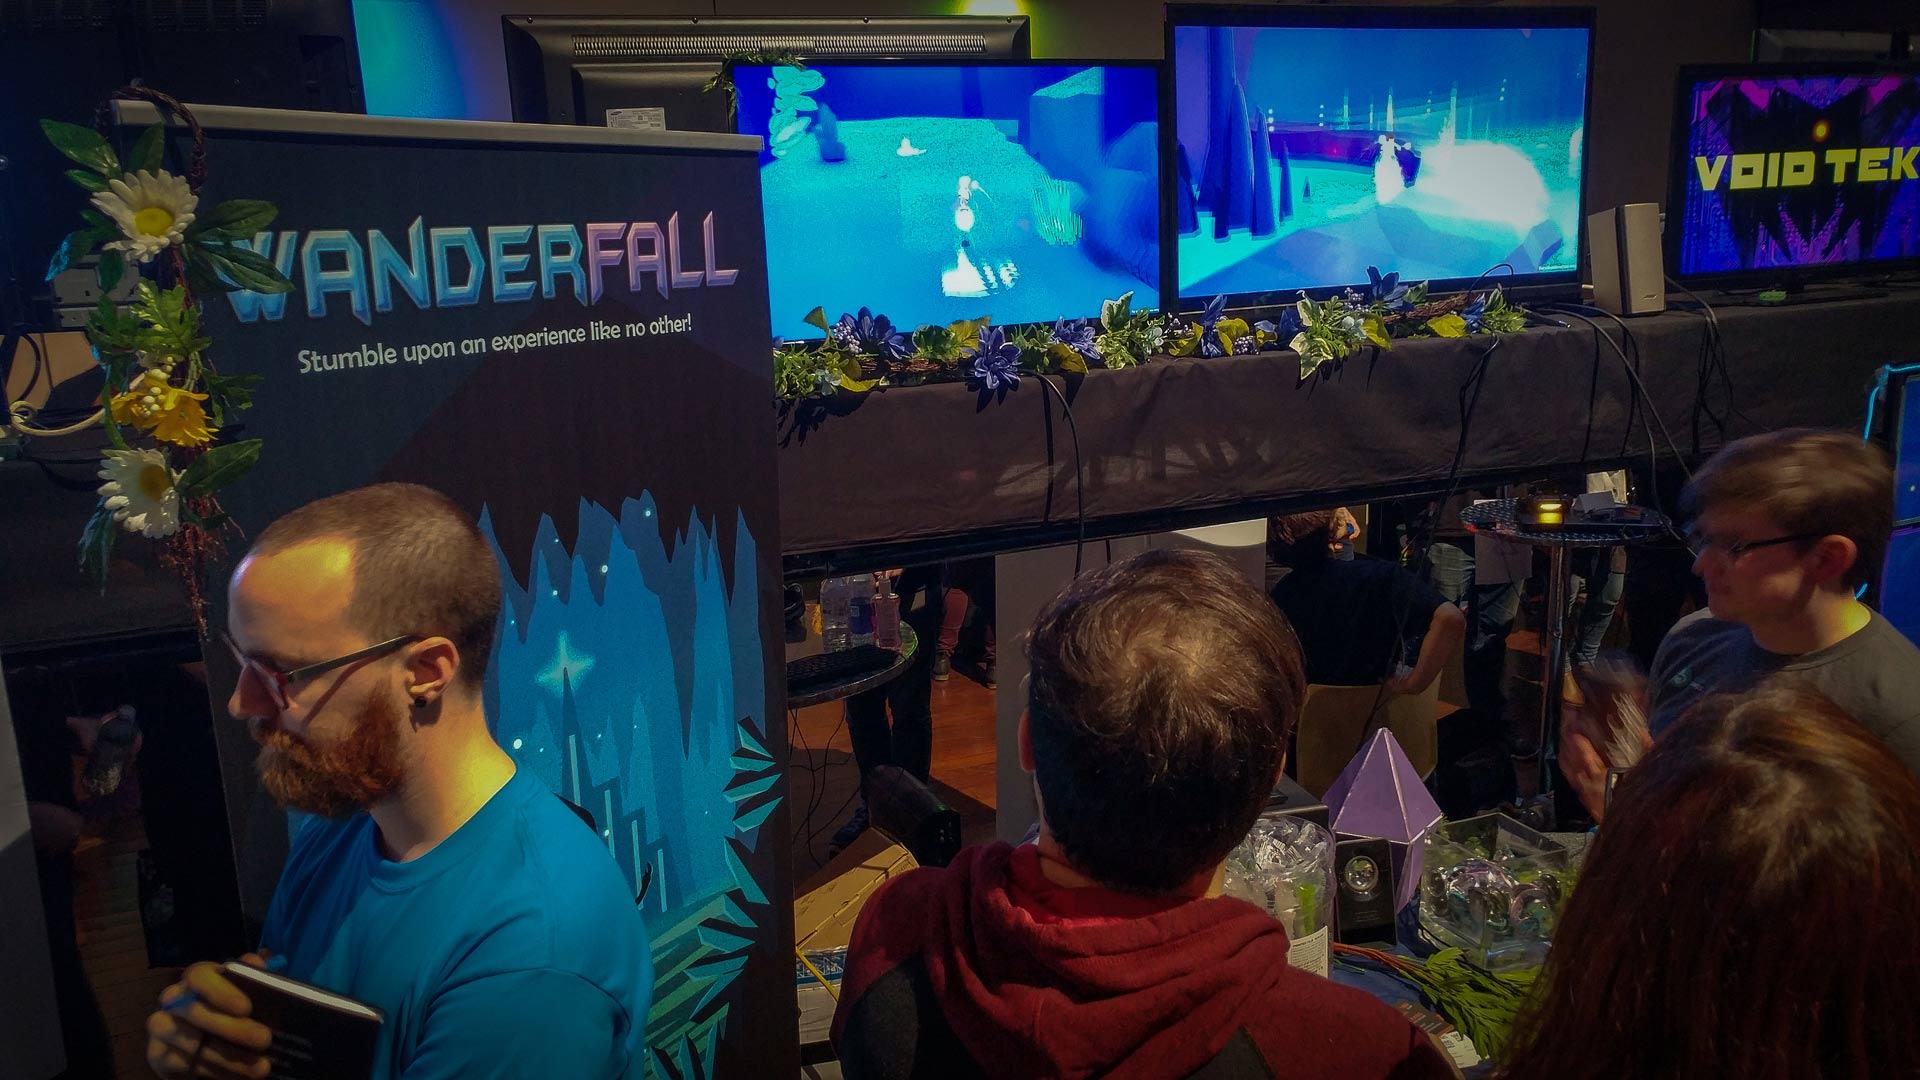 levelup2018-wanderfall.jpg